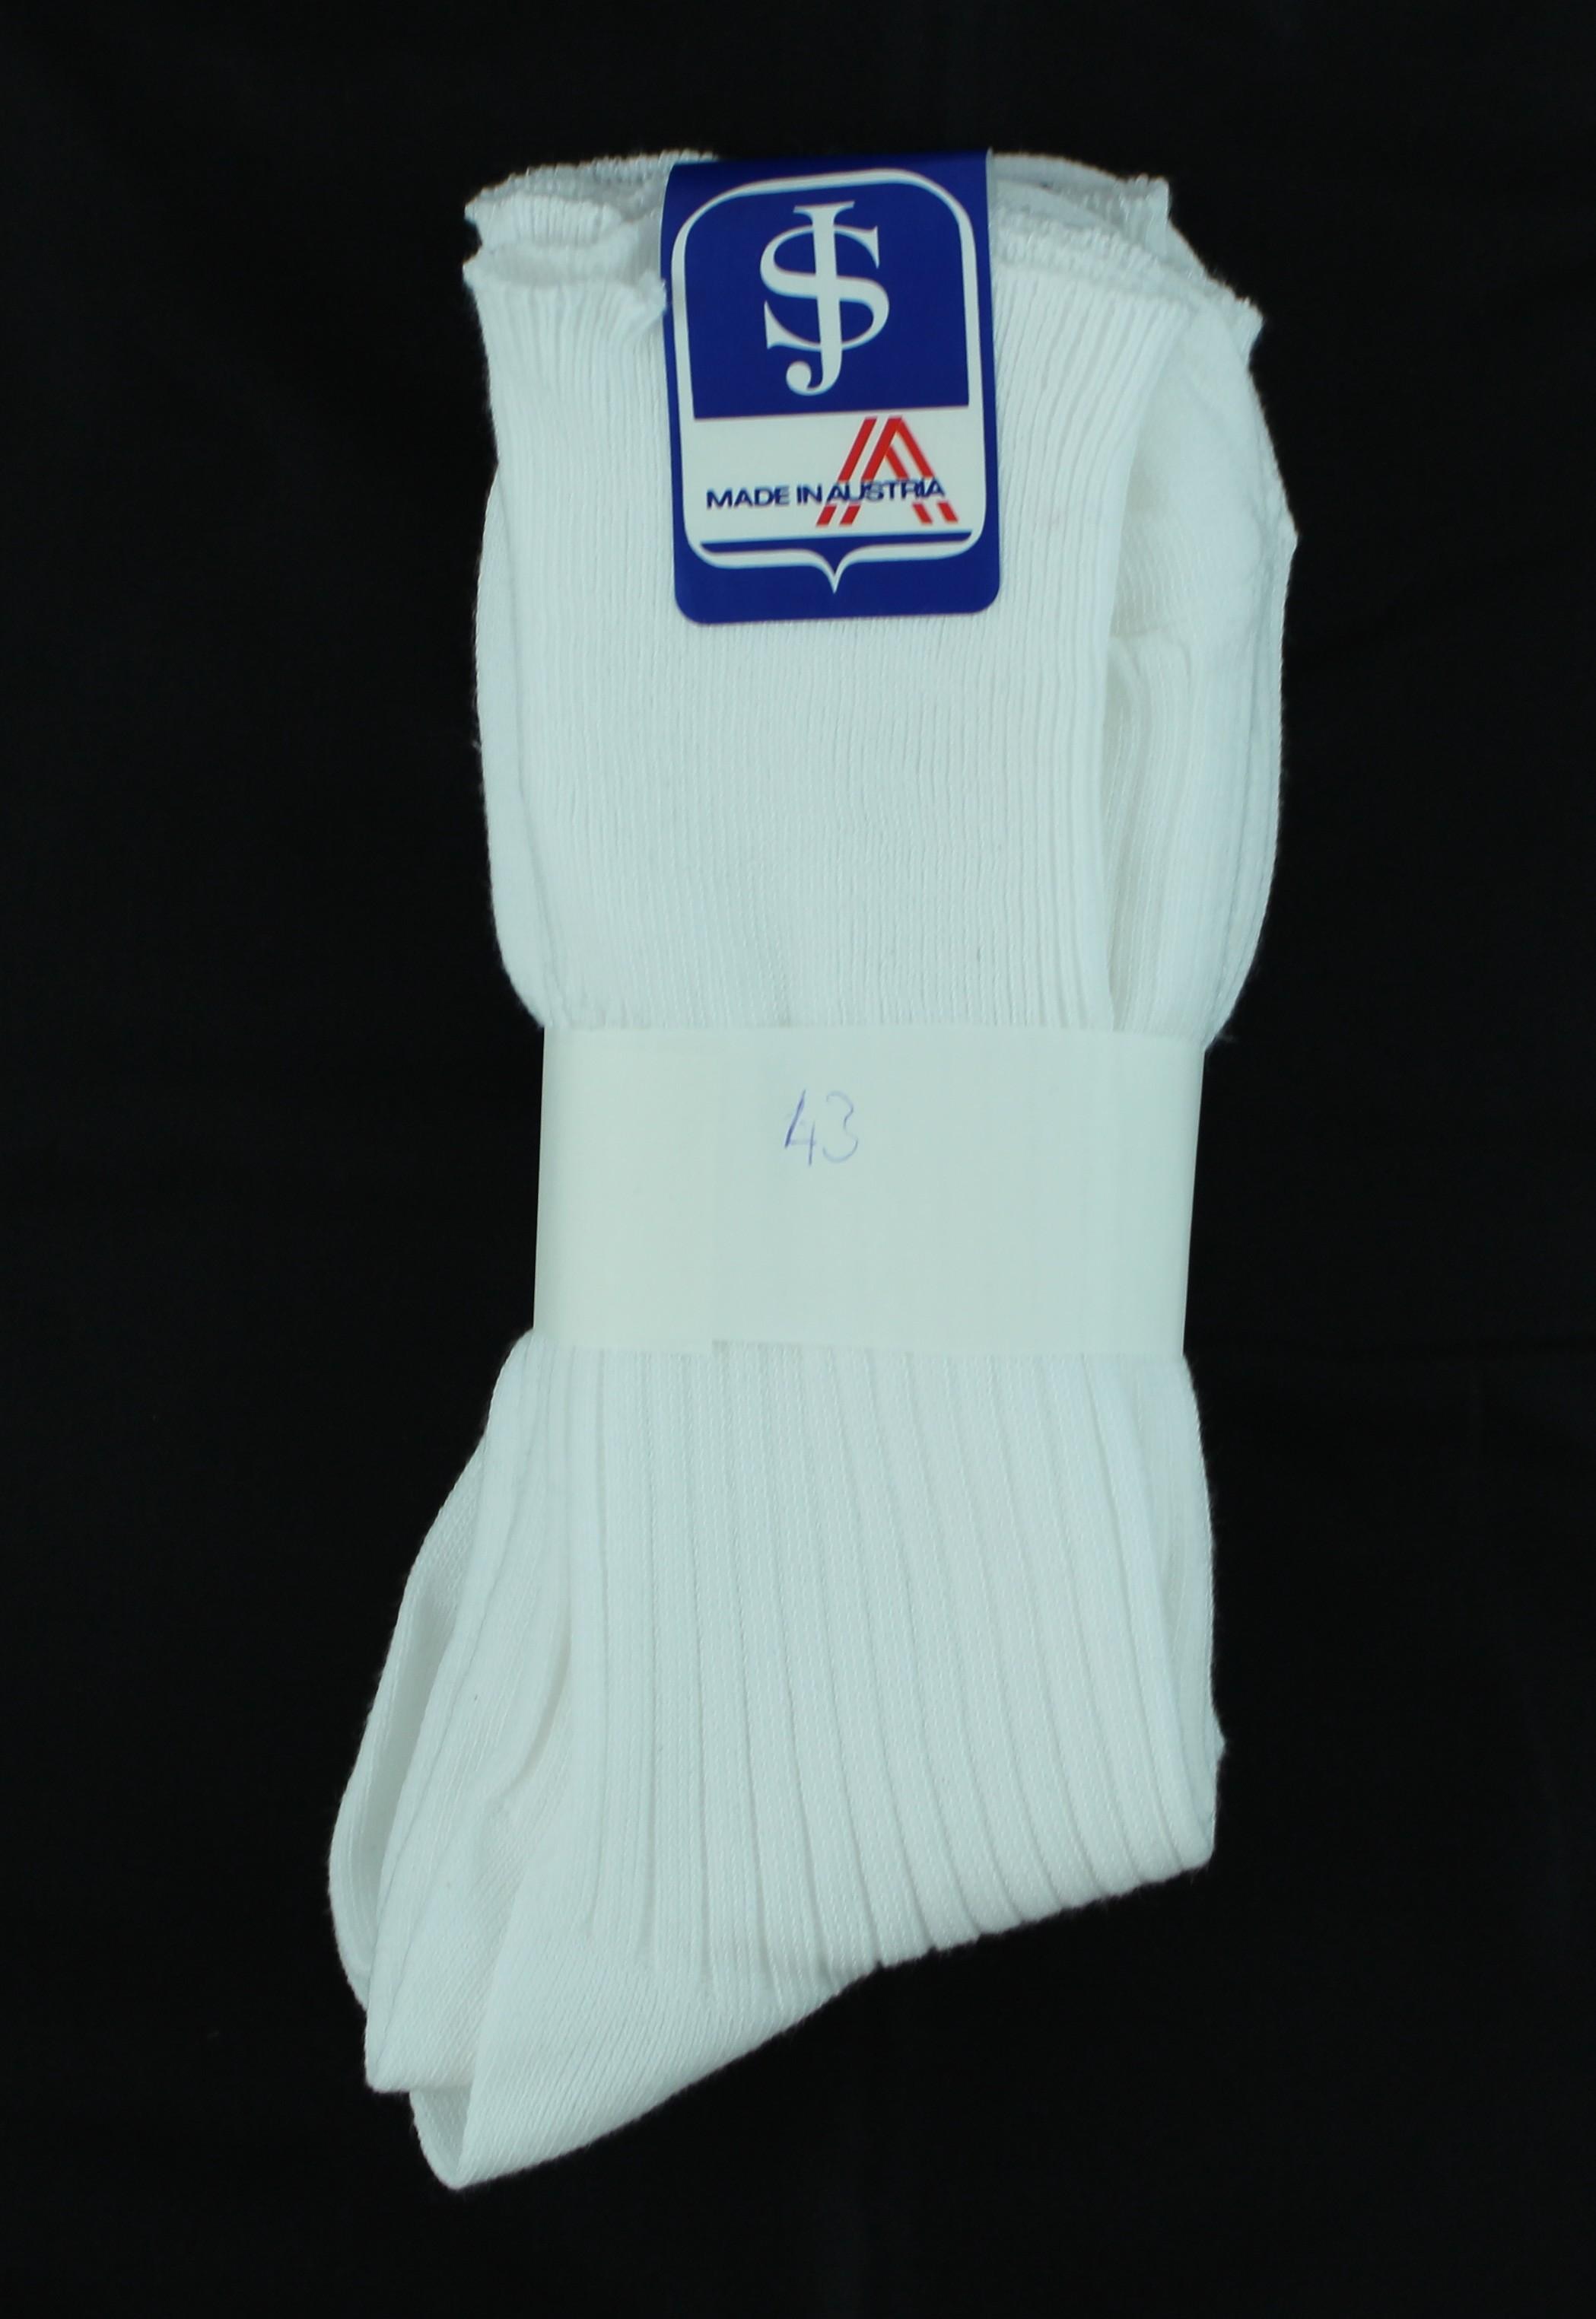 100% Baumwoll Socken (3er Pack)